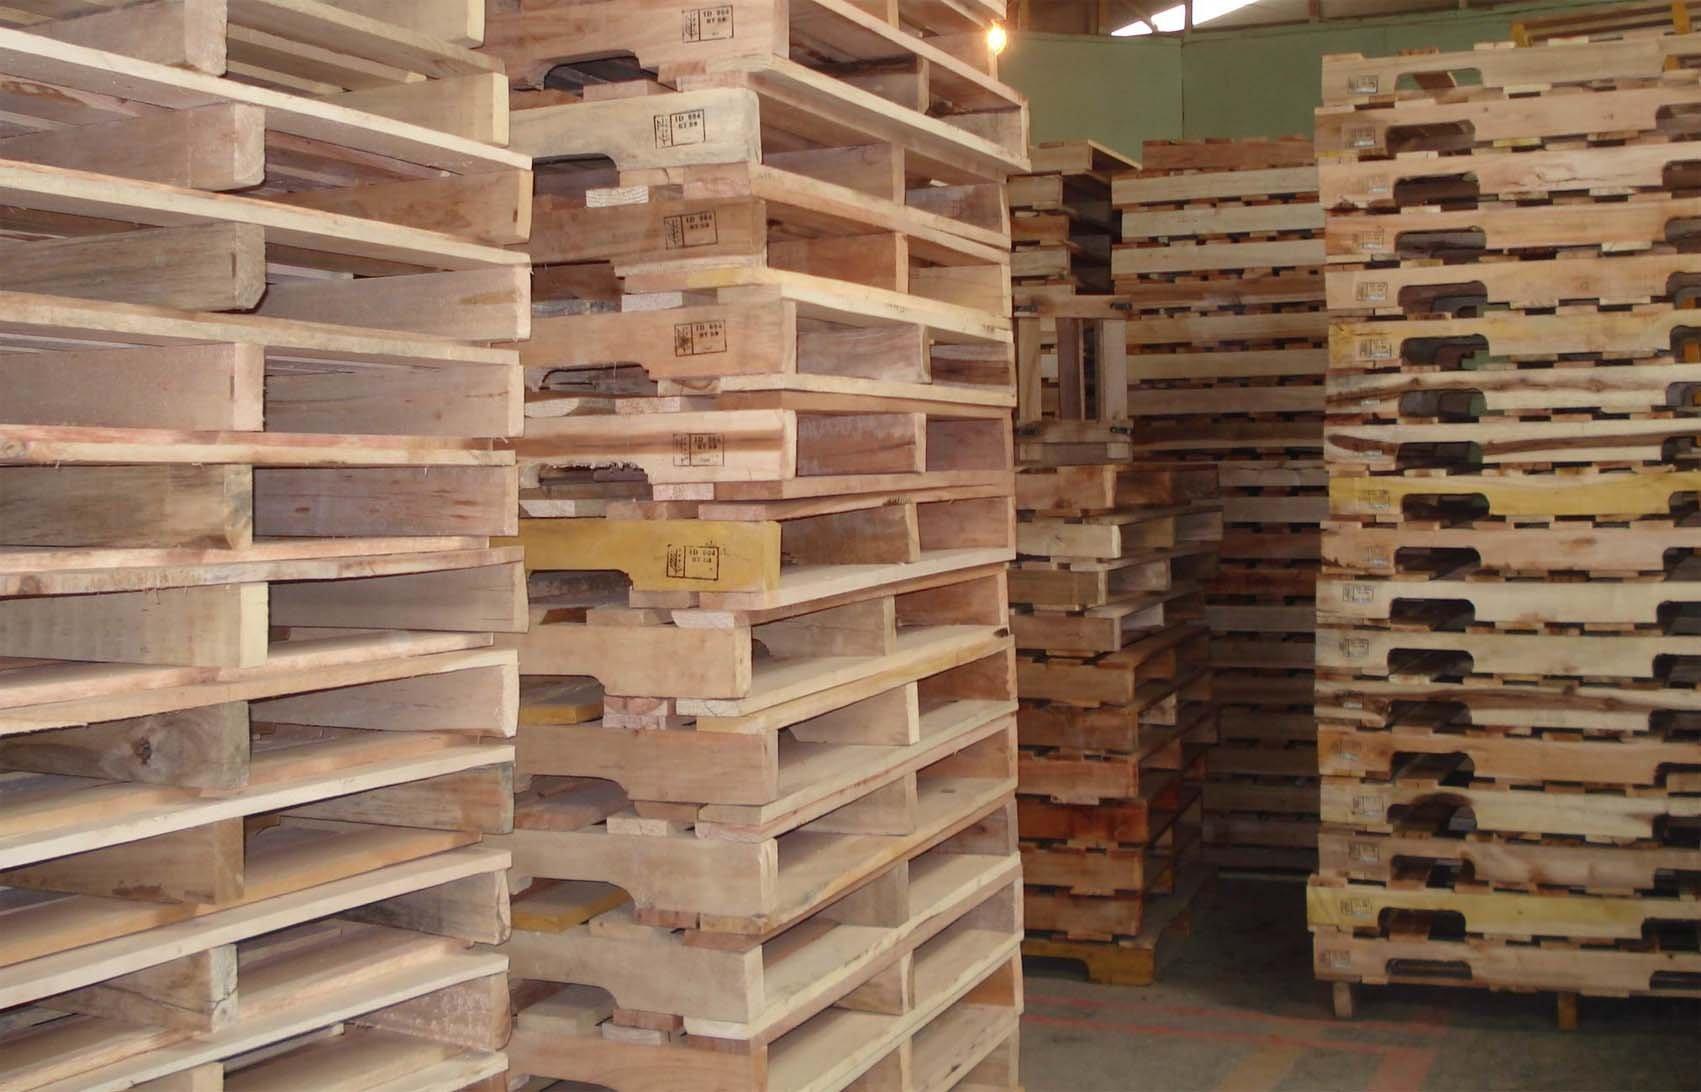 Paletes de madeira Paletes ID do produto:107078774 portuguese.alibaba  #8E6C3D 1701x1092